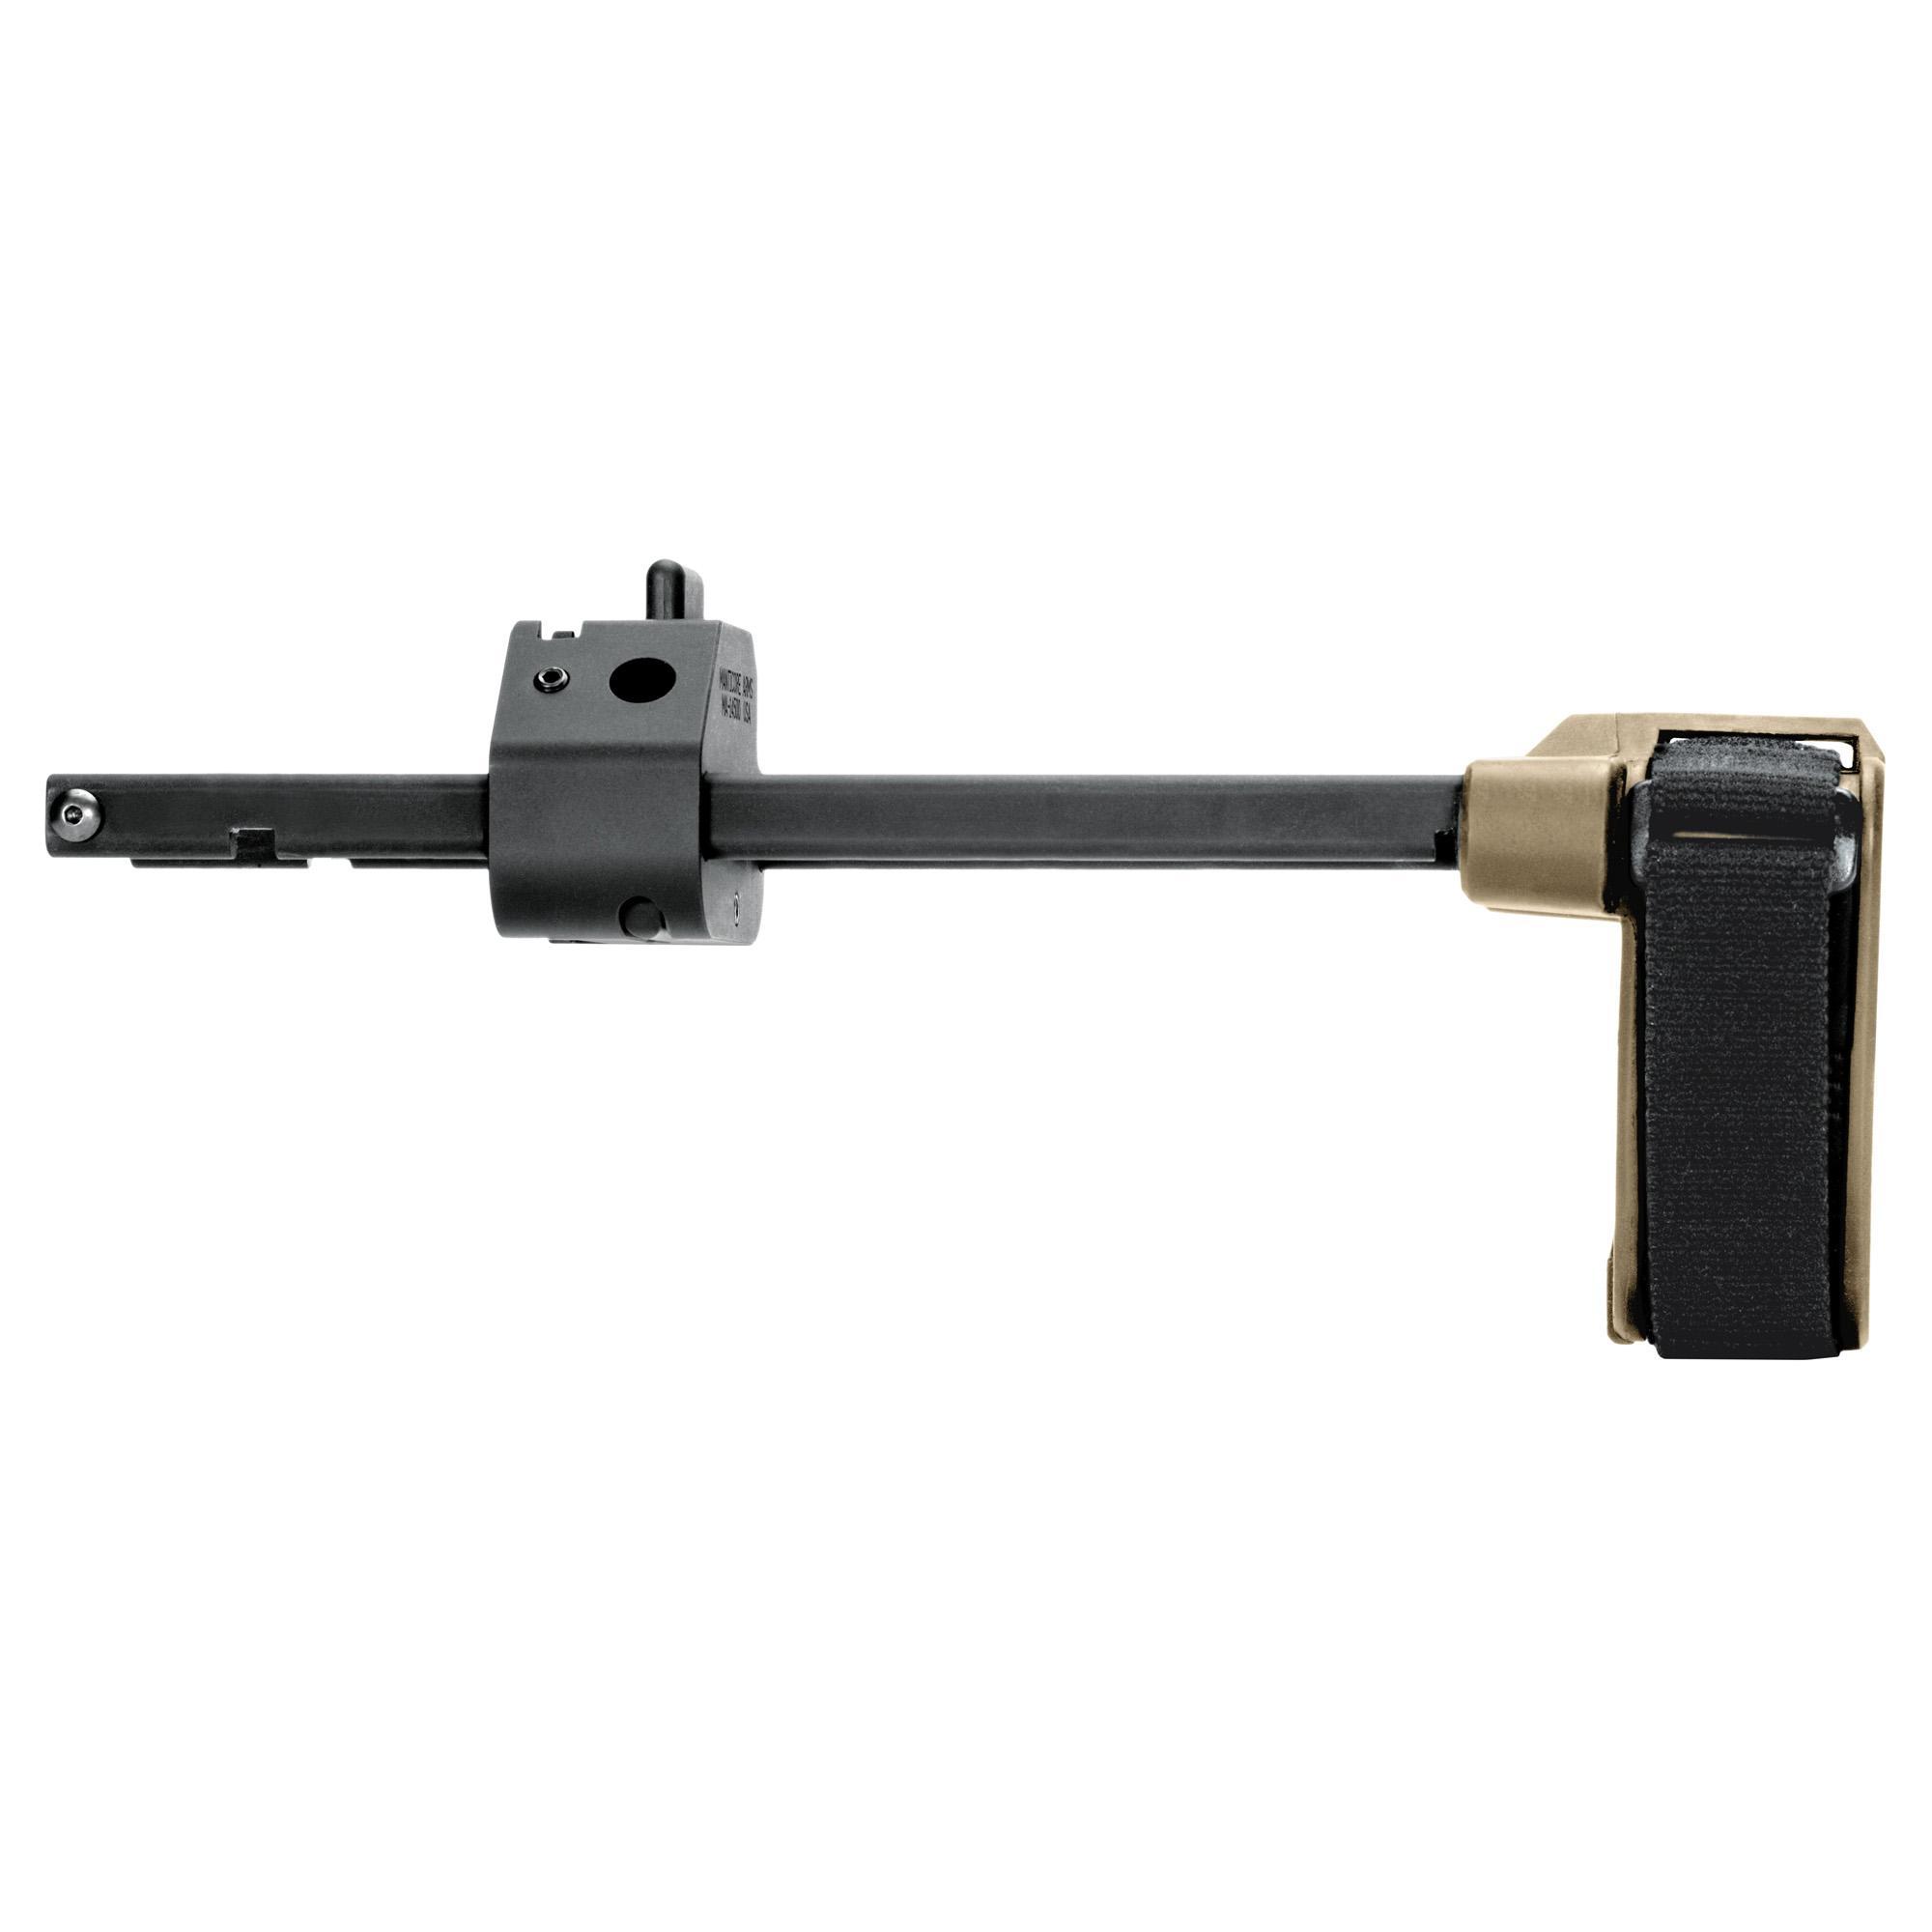 SB Tactical Sb Tactical Cz Pdw Pistol Brace 3 Pos Fd